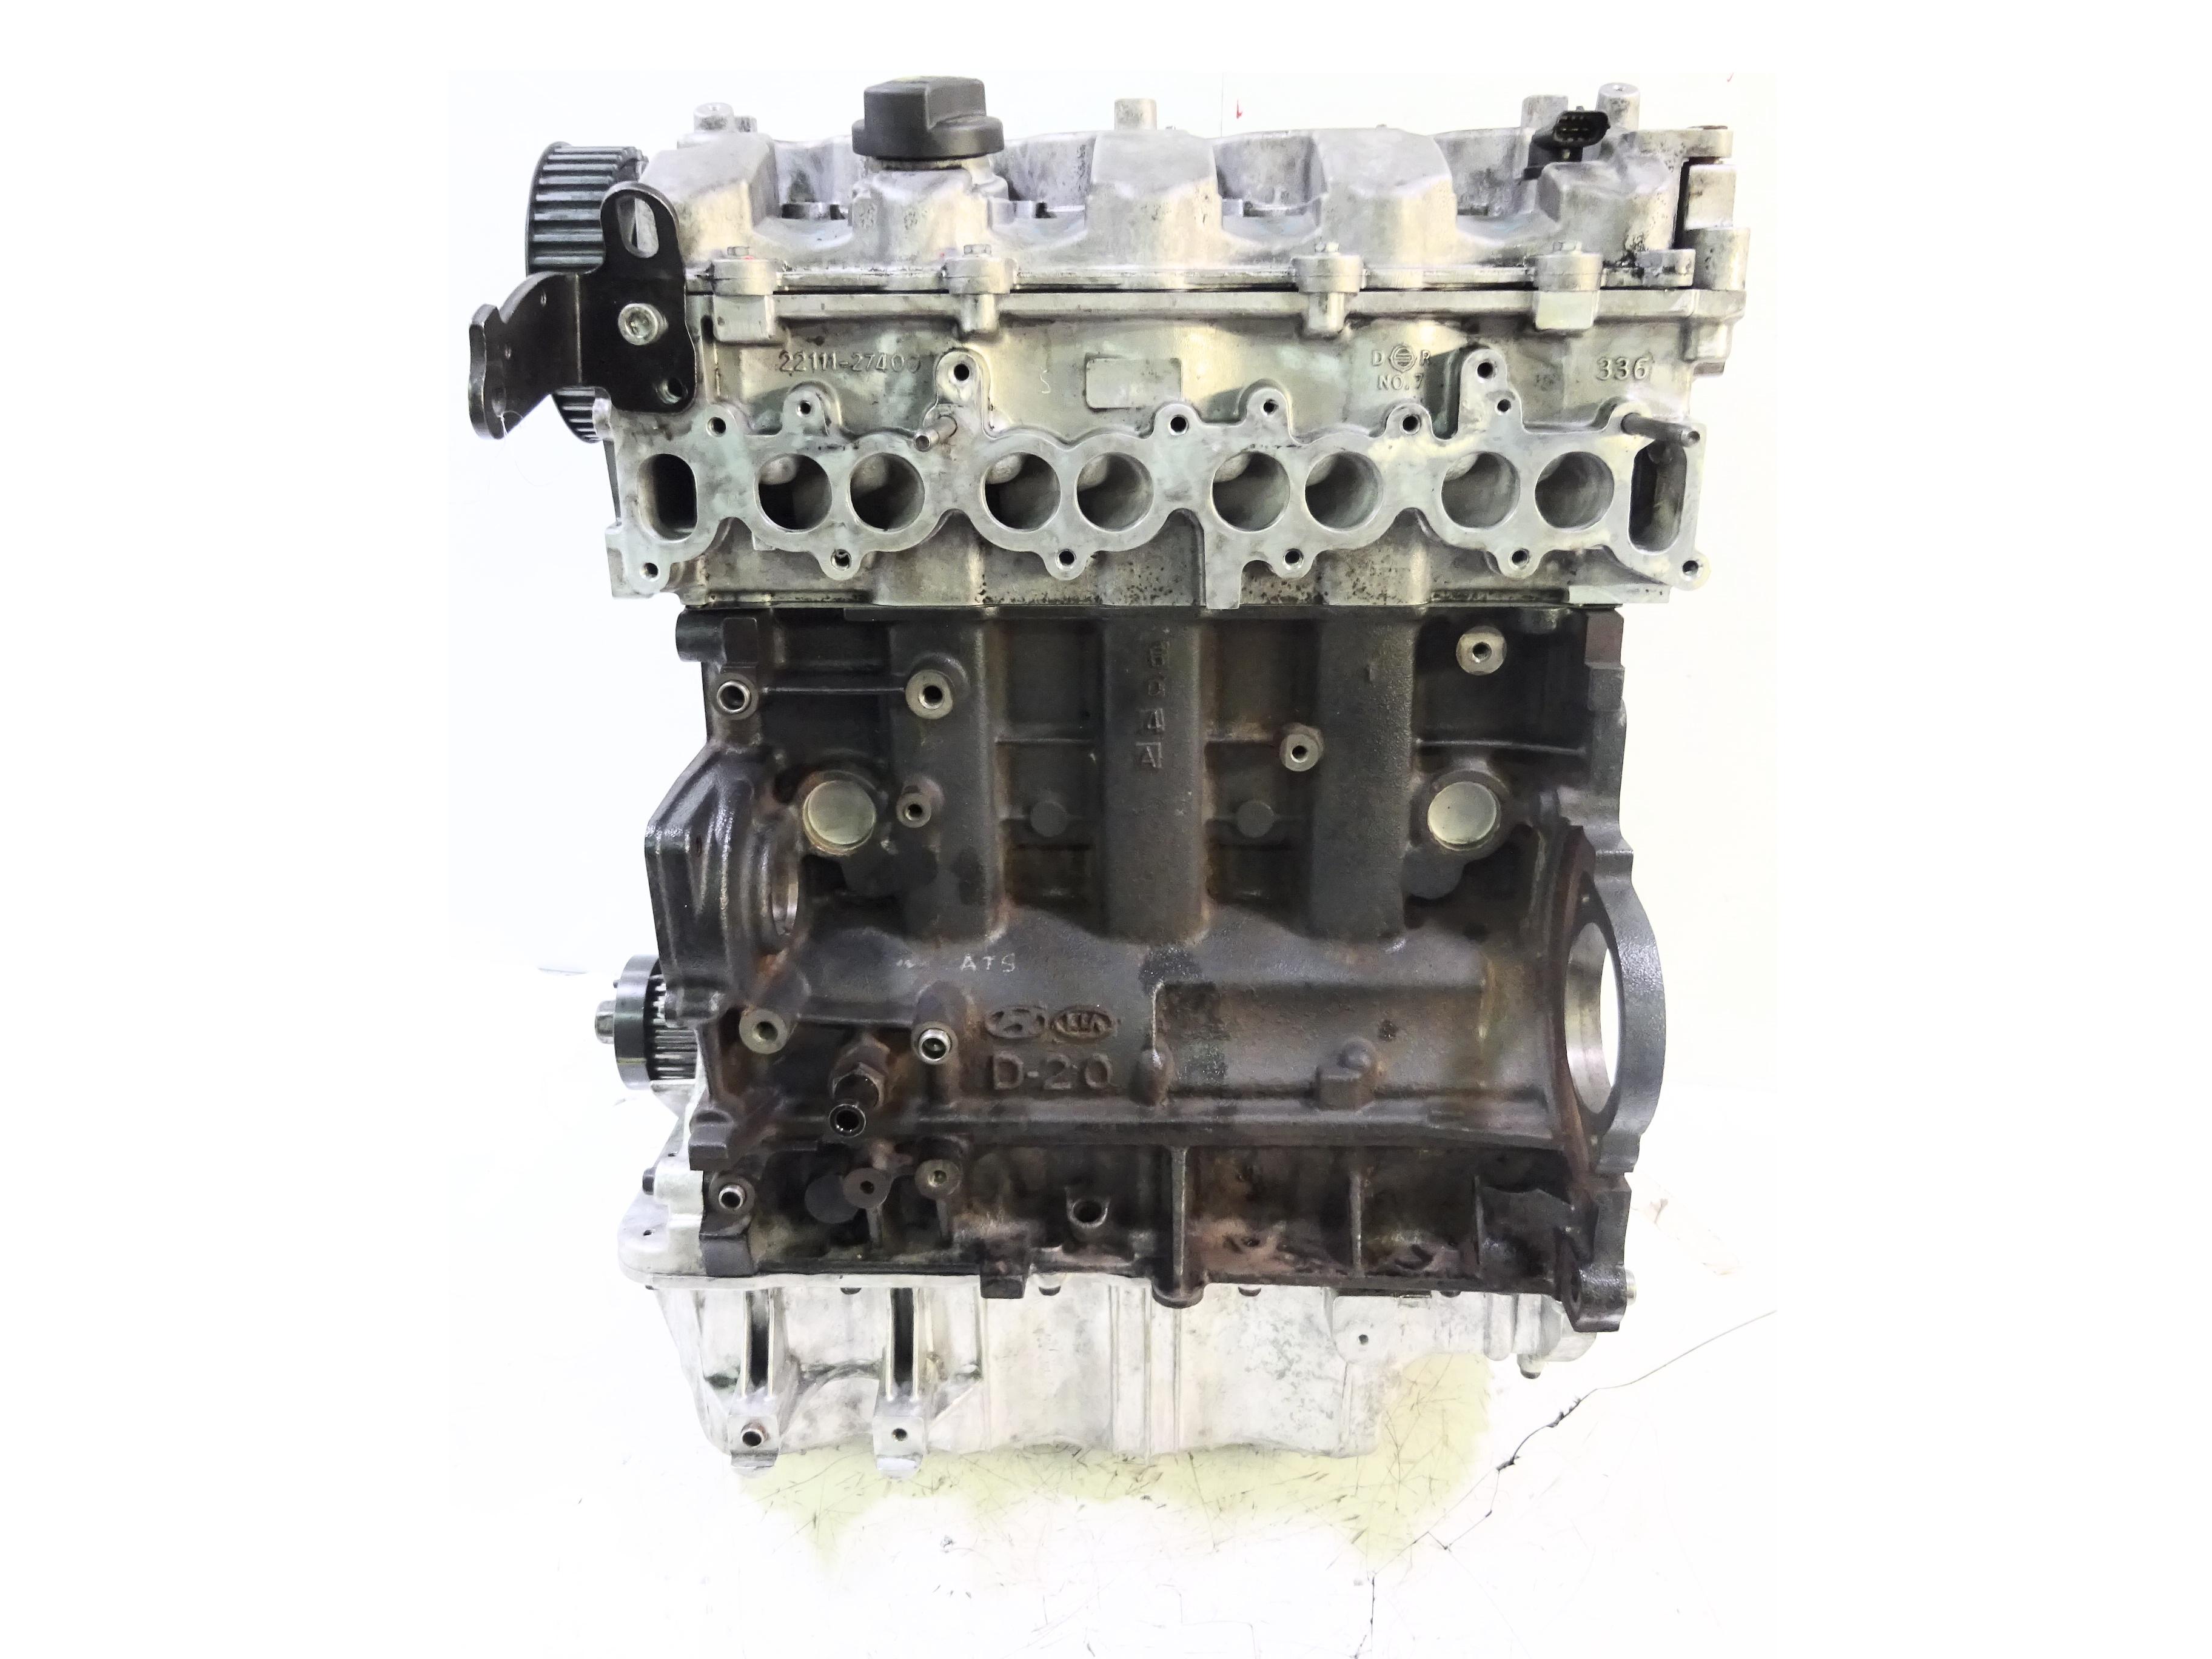 Motor 2007 Kia Hyundai i30 Santa Fe 2,0 CRDi D4EA Kopf geplant Dichtung NEU